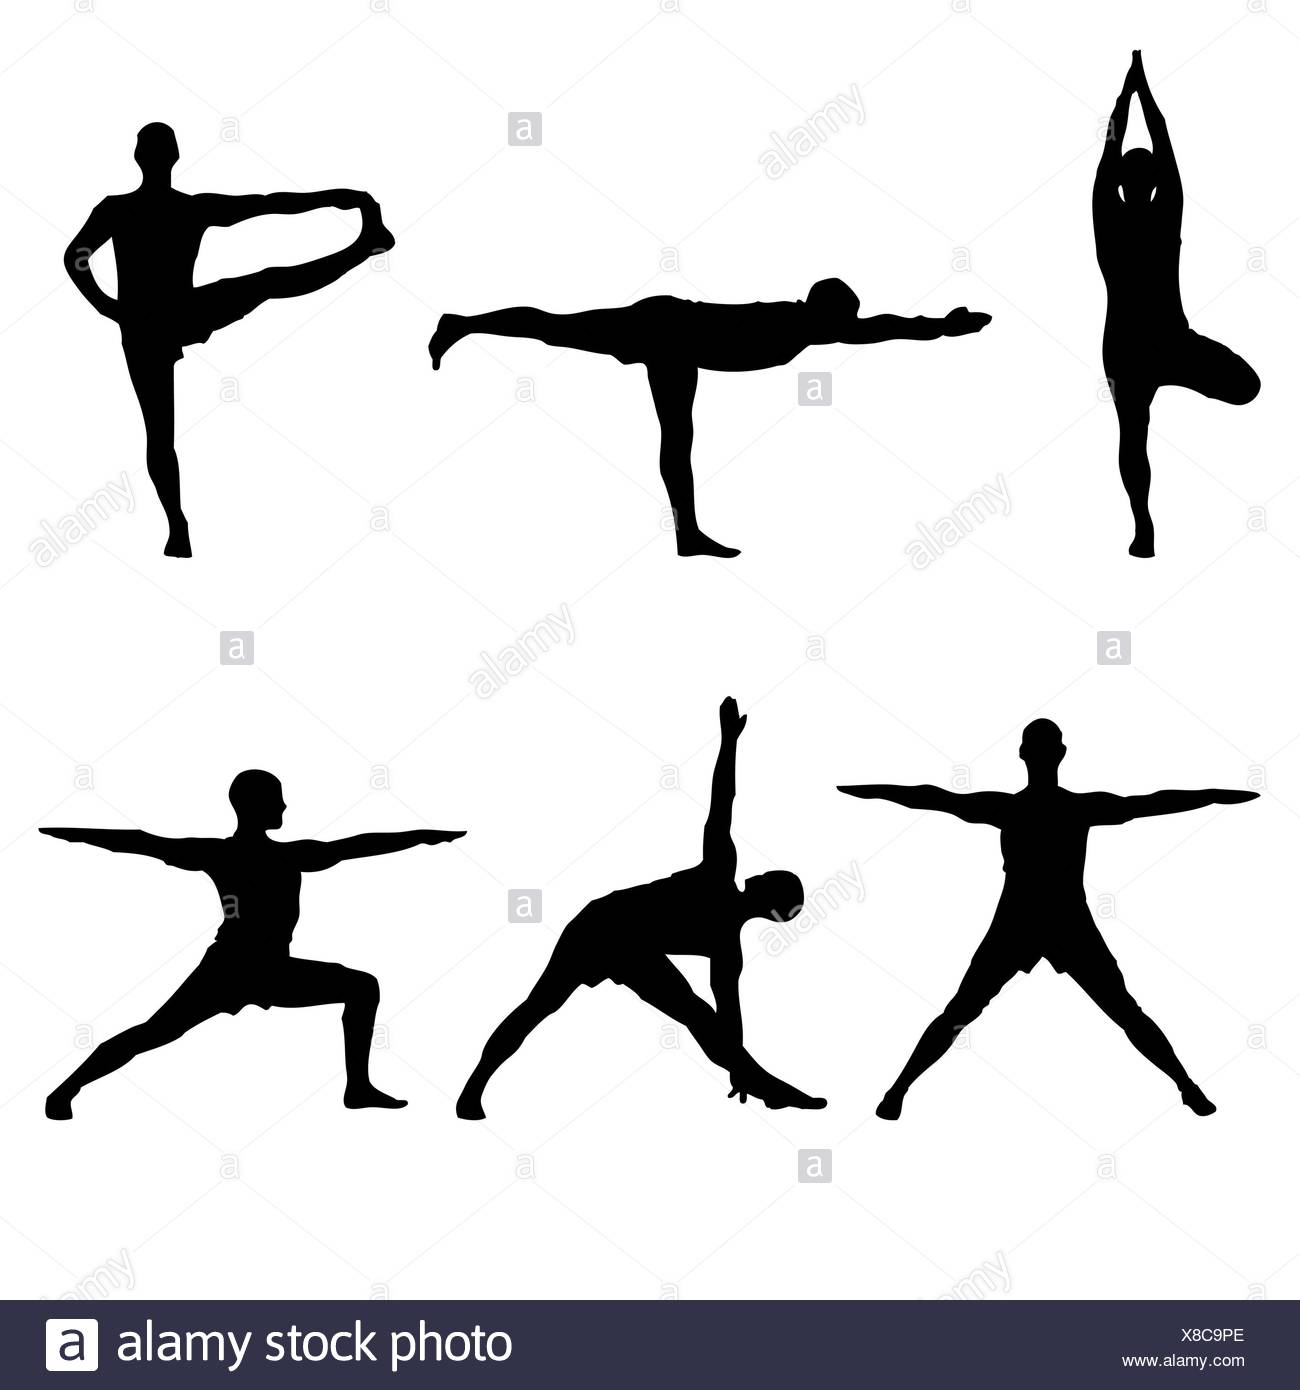 six yoga standing poses - Stock Image